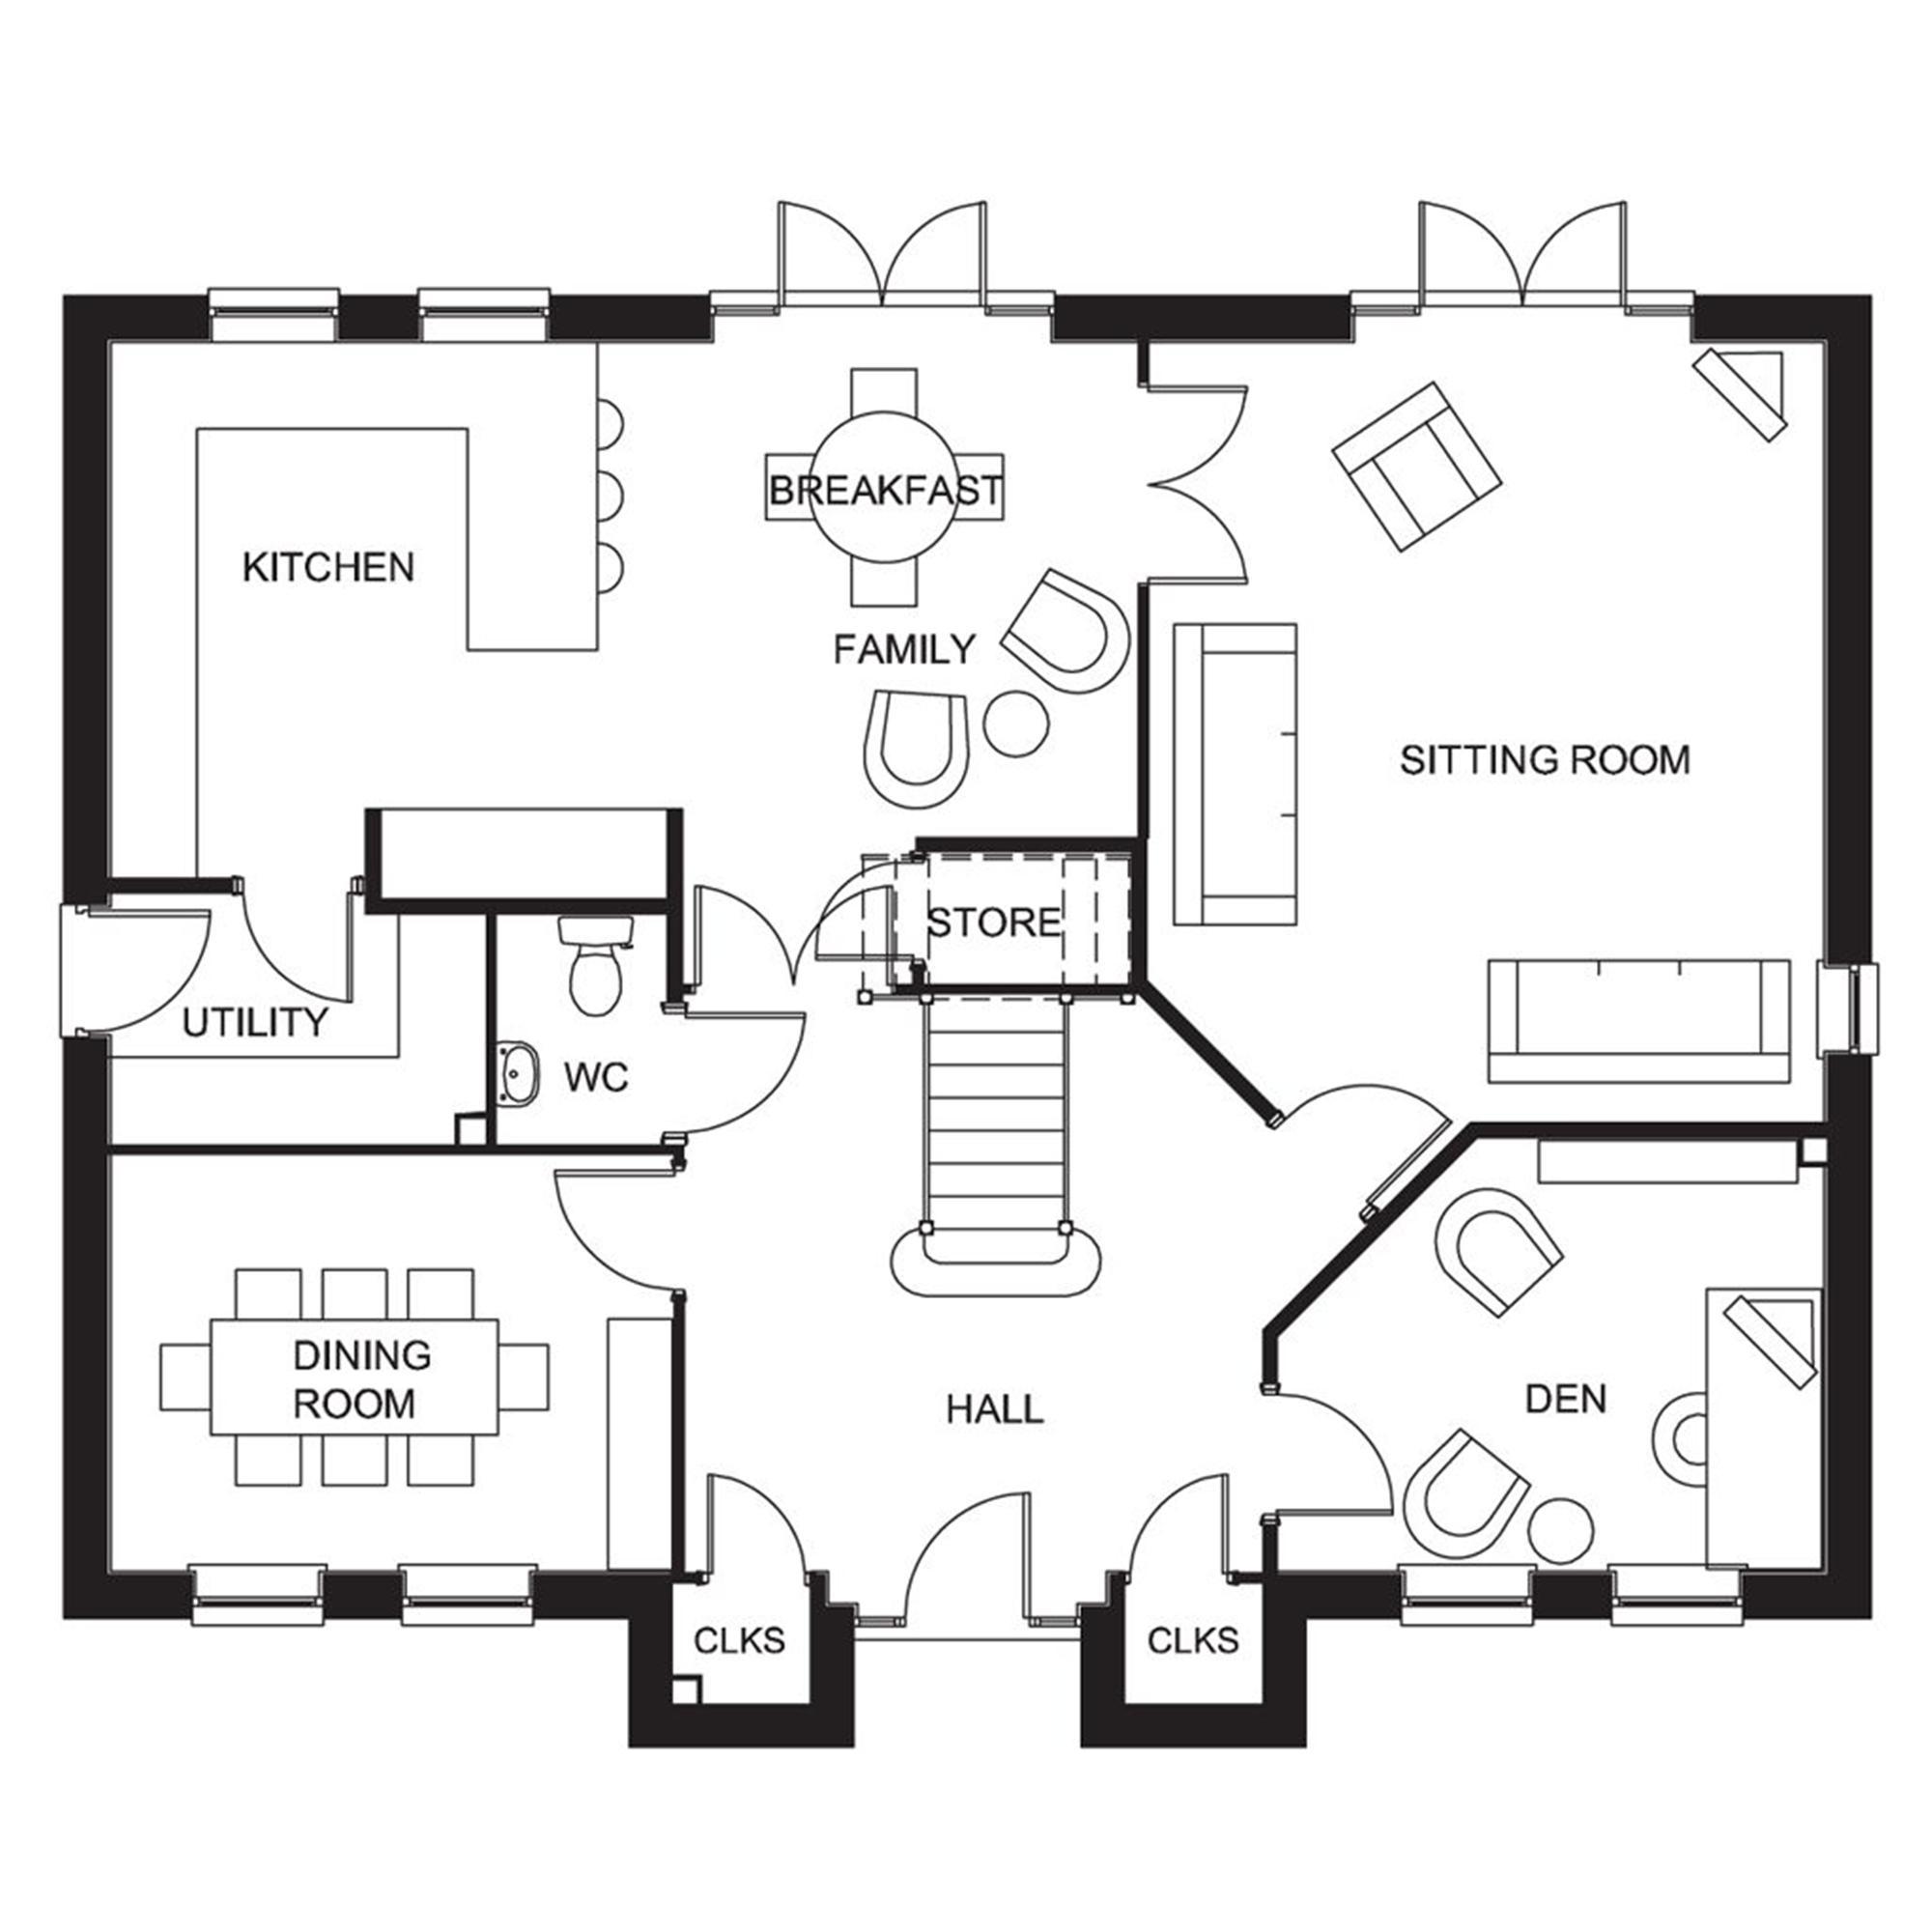 wilson homes floor plans homes home plans ideas picture david wilson homes floor plans